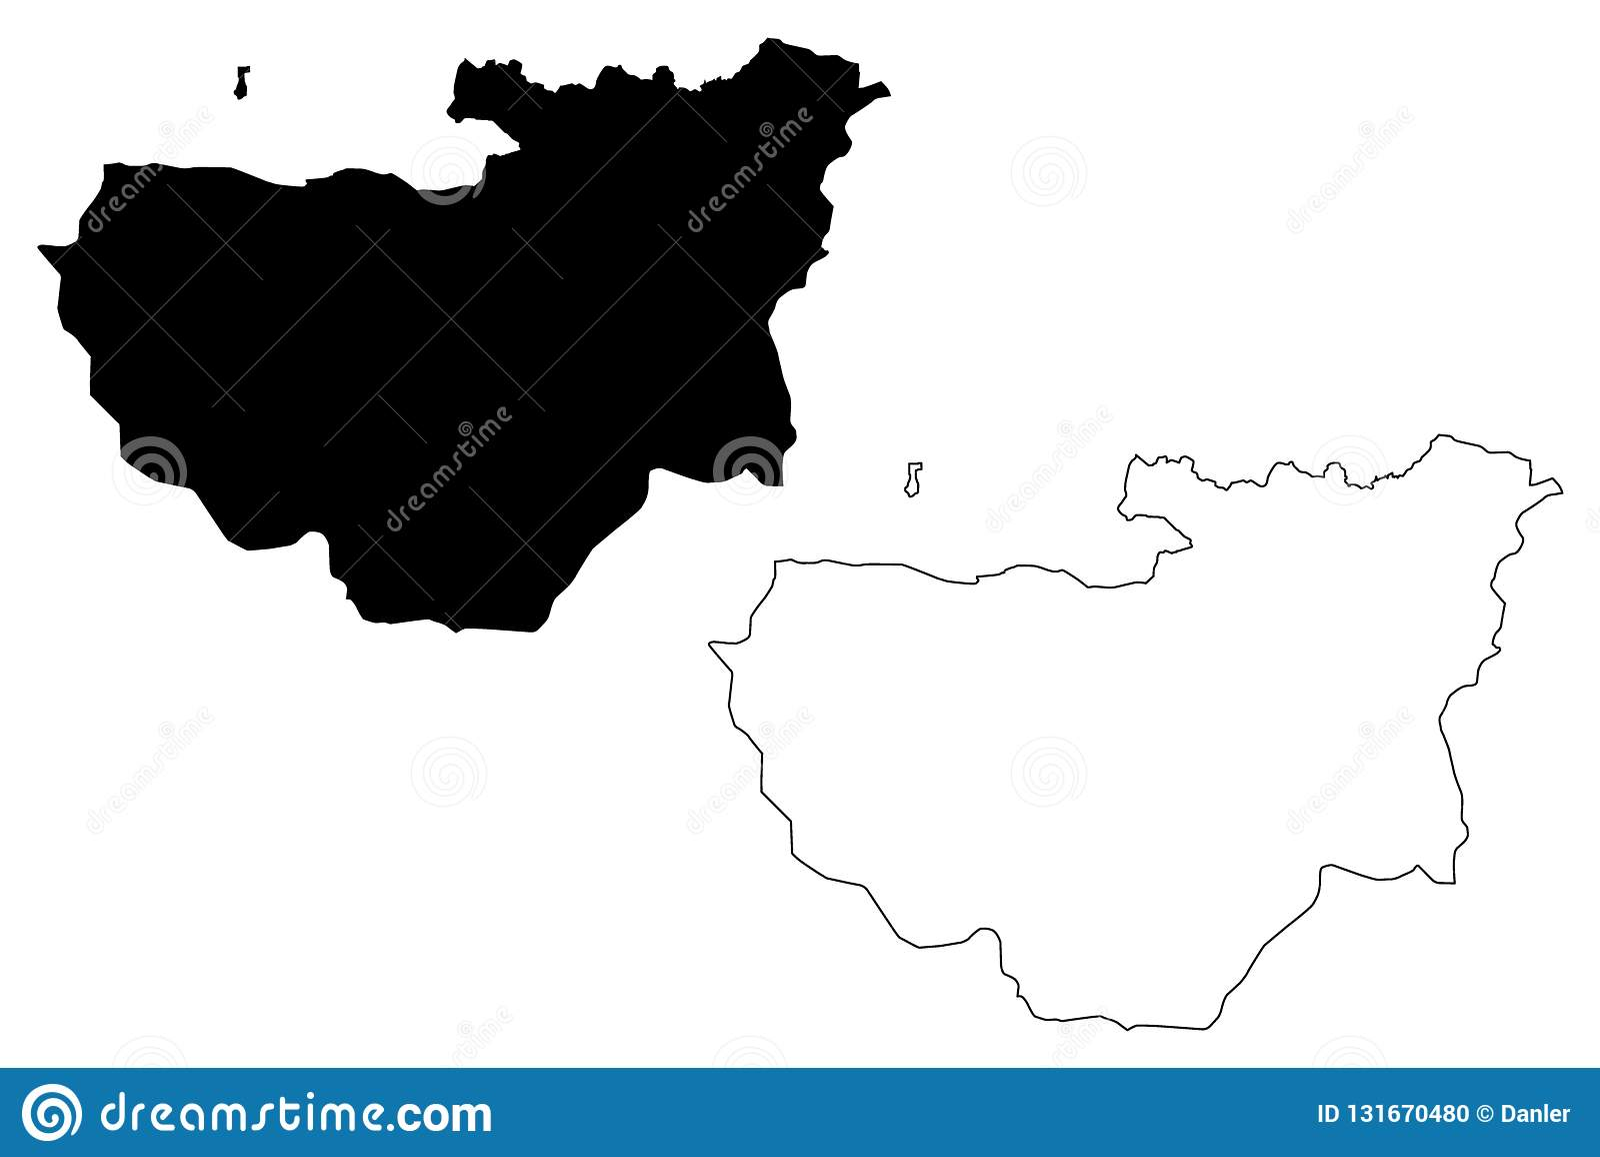 Bursa map vector stock vector. Illustration of cartography ...